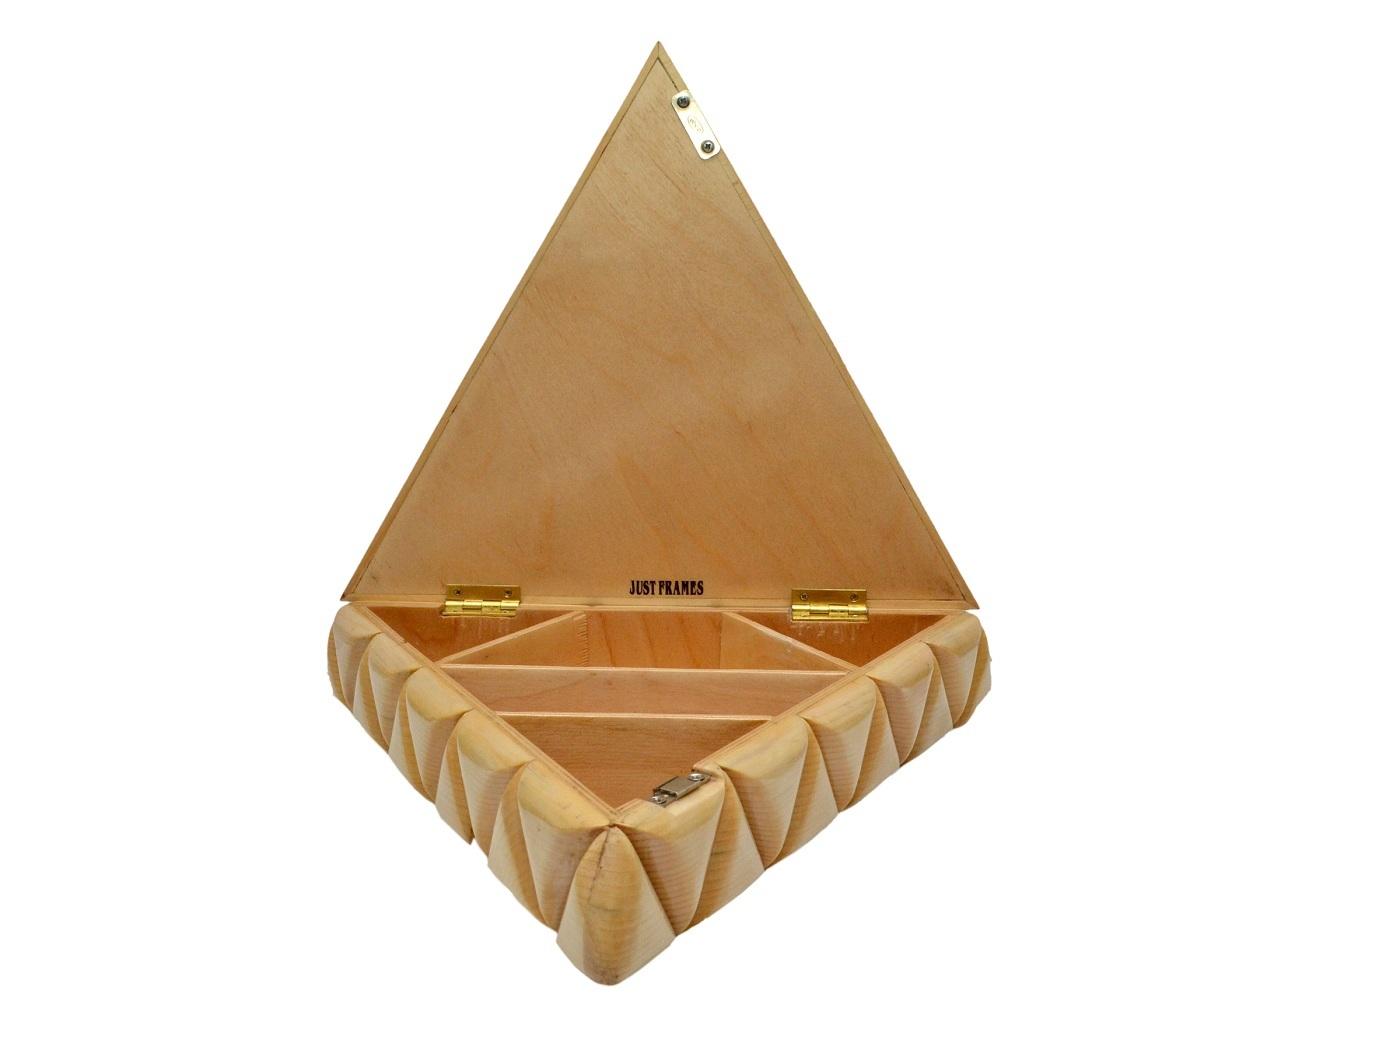 Triangle Shape Wooden Dryfruit Box